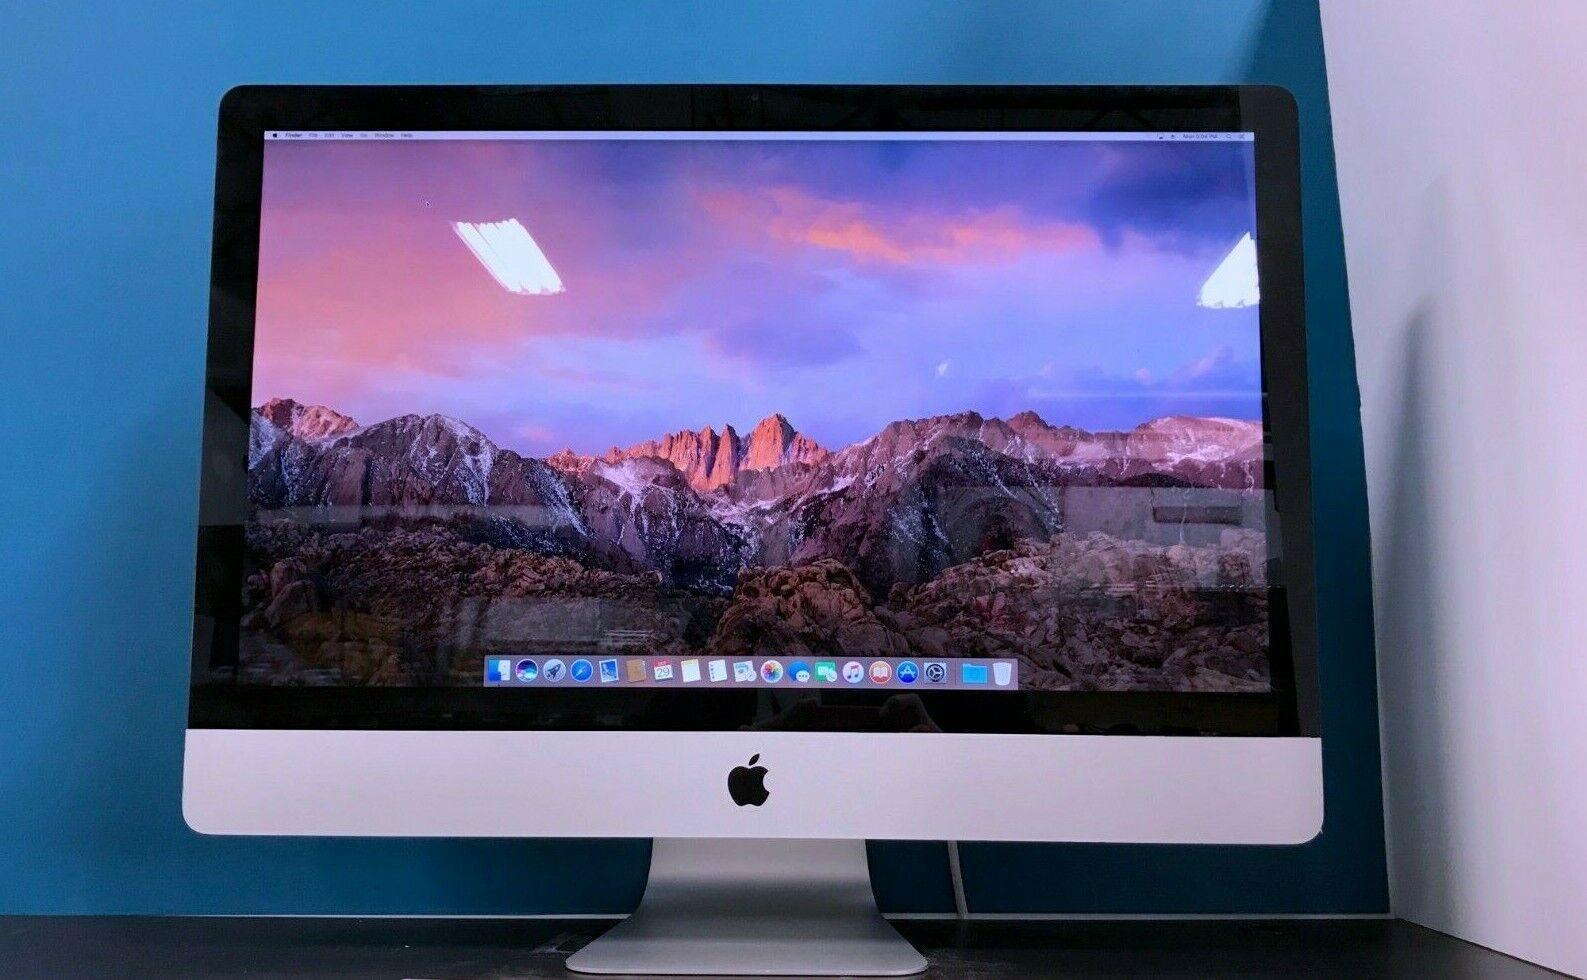 Apple iMac 27 Desktop All-In-One | 3.7GHZ TURBO | 1TB | OS2019 | 2 YEAR WARRANTY. Buy it now for 699.00